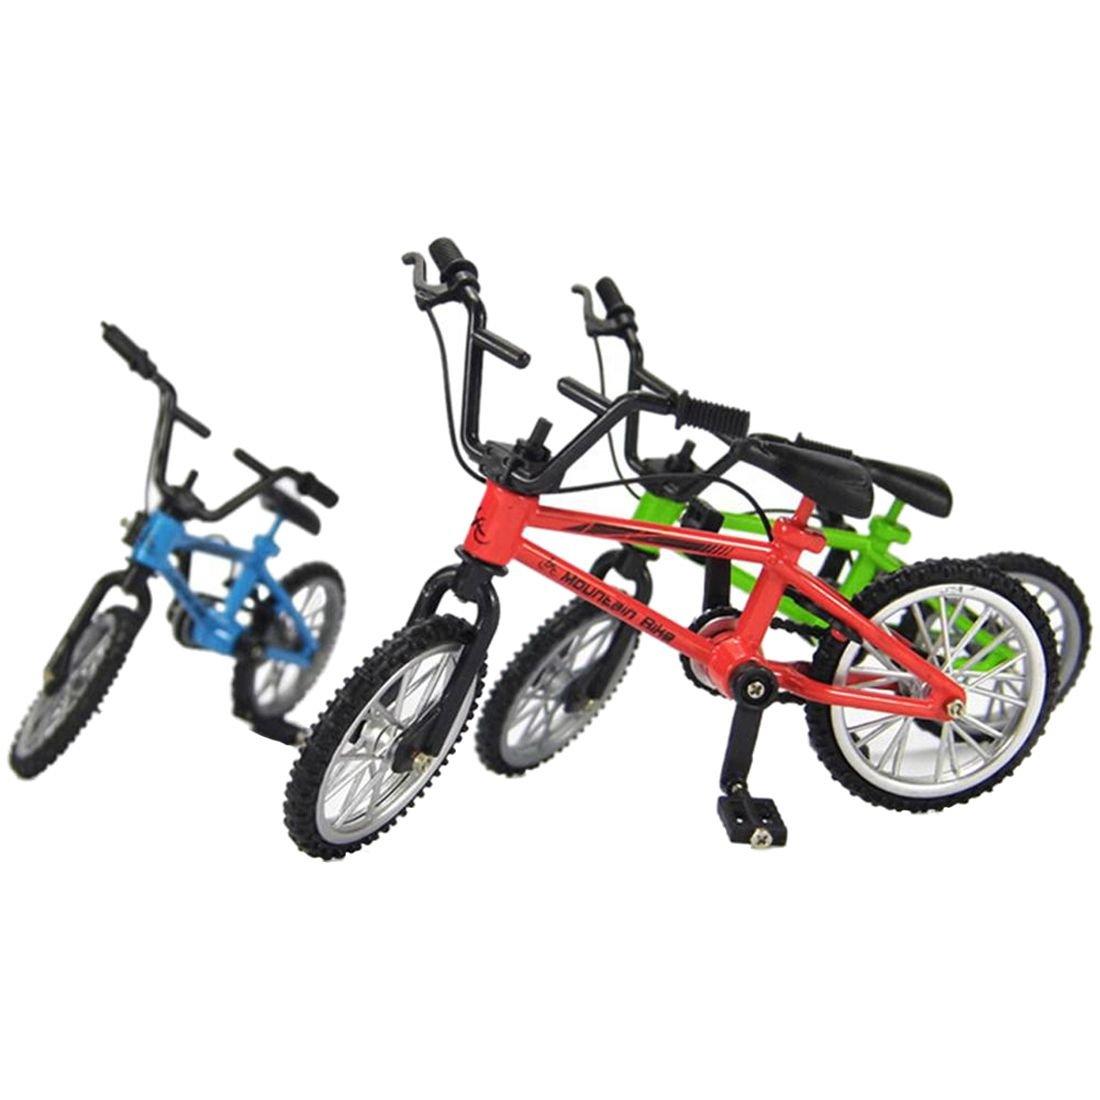 SODIAL Tech Deck Finger Bike Bicycle+ Finger Board Boy Kid Children Wheel BMX Toy S 136426